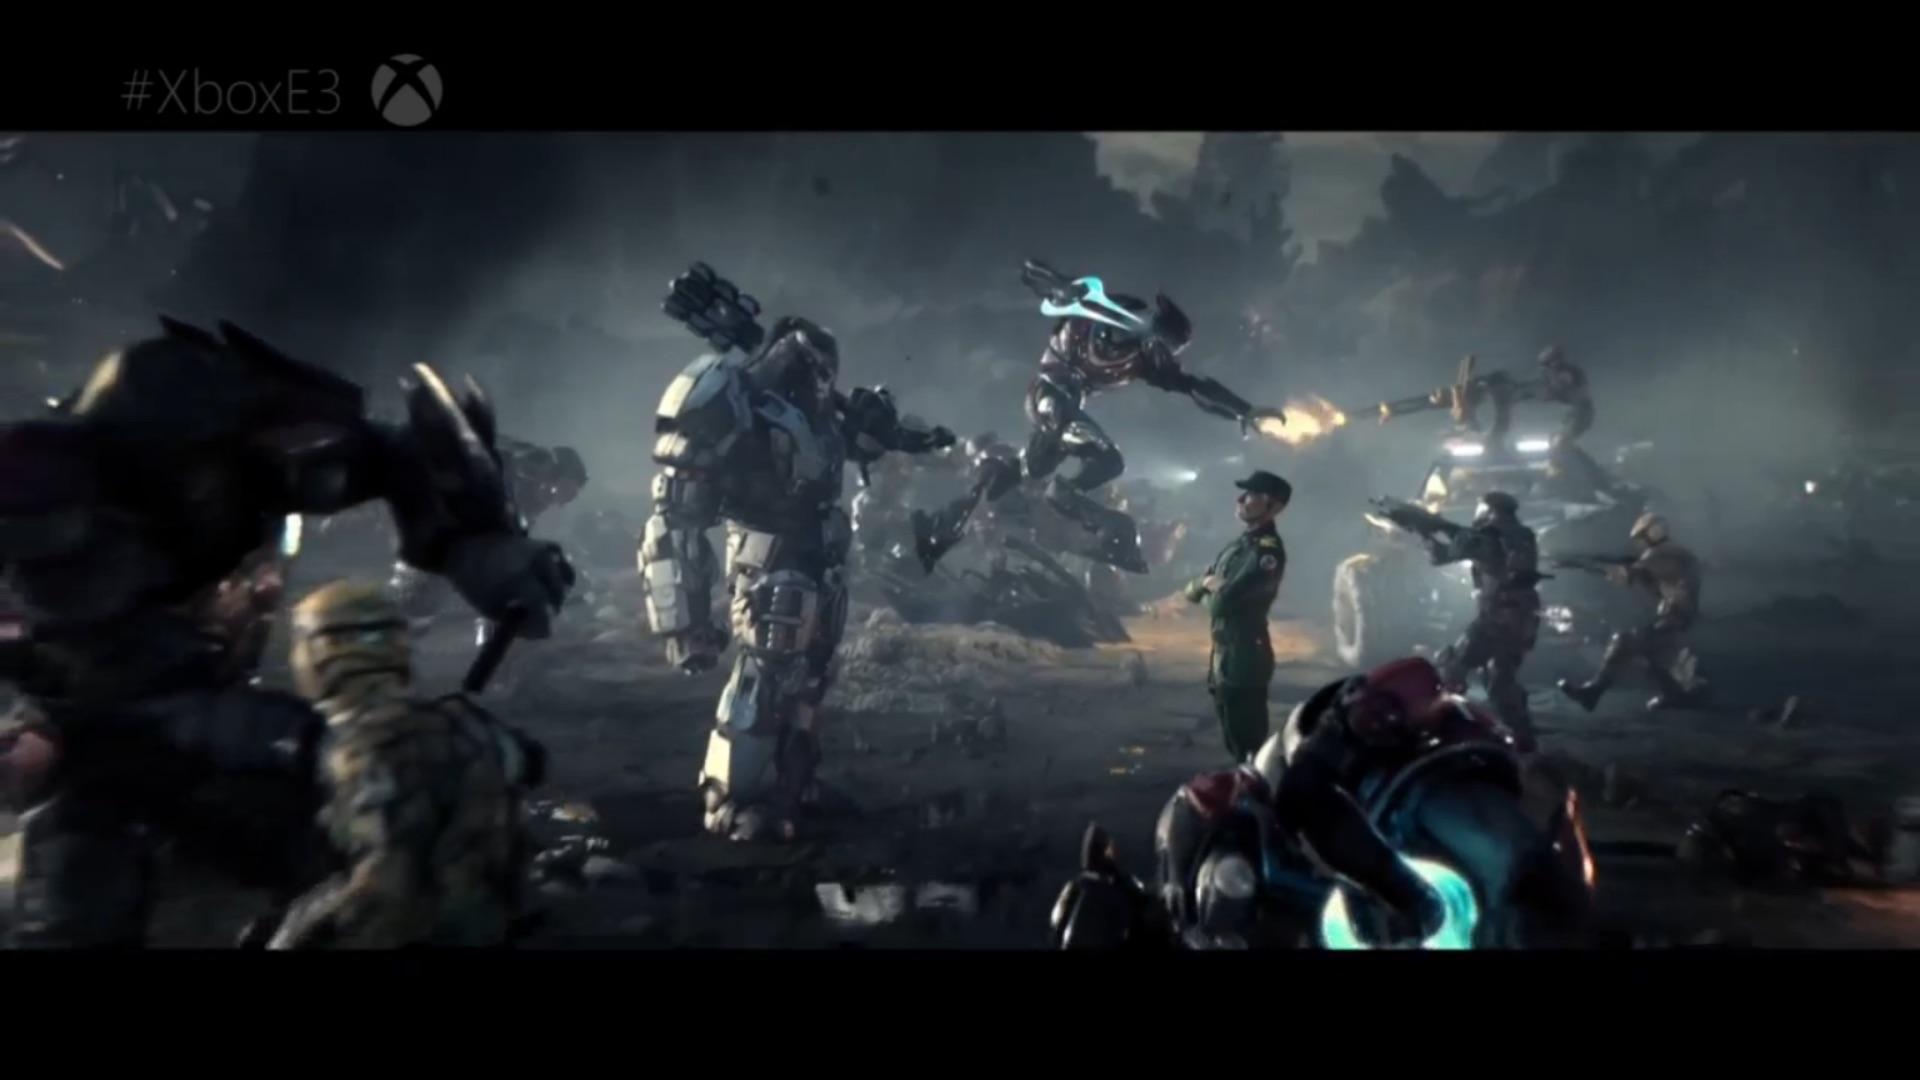 Halo Wars 2 coming February 21, 2017, beta playable today